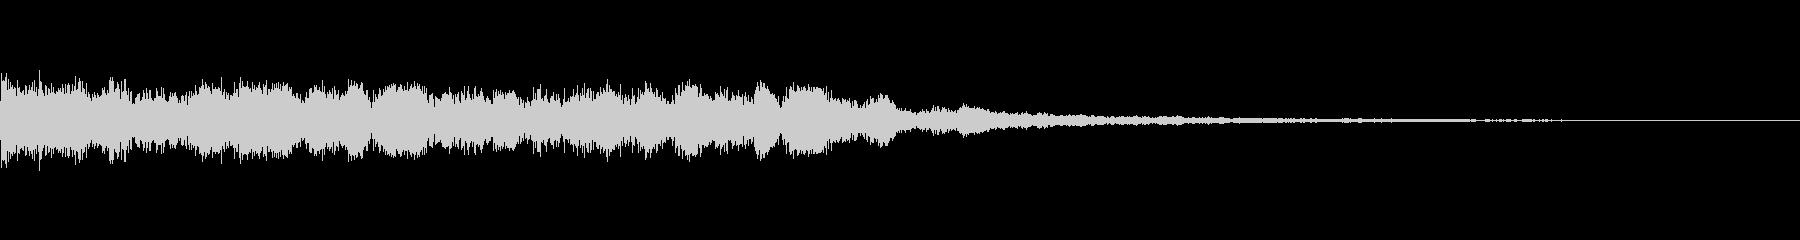 SF_選択、決定音9の未再生の波形